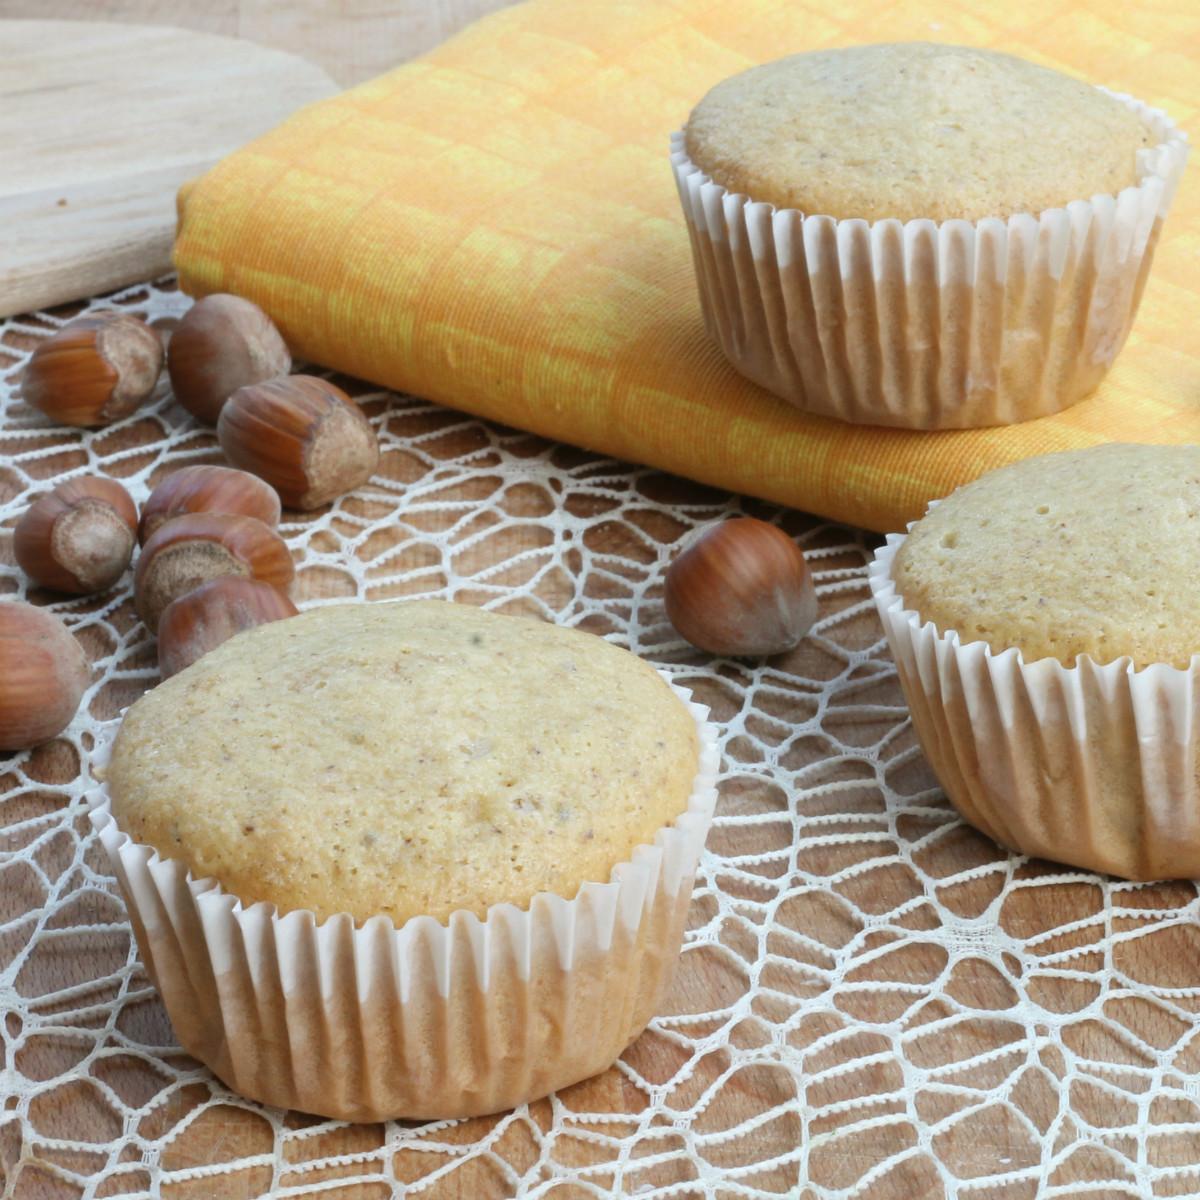 https://blog.giallozafferano.it/inventaricette/dolci-senza-burro/